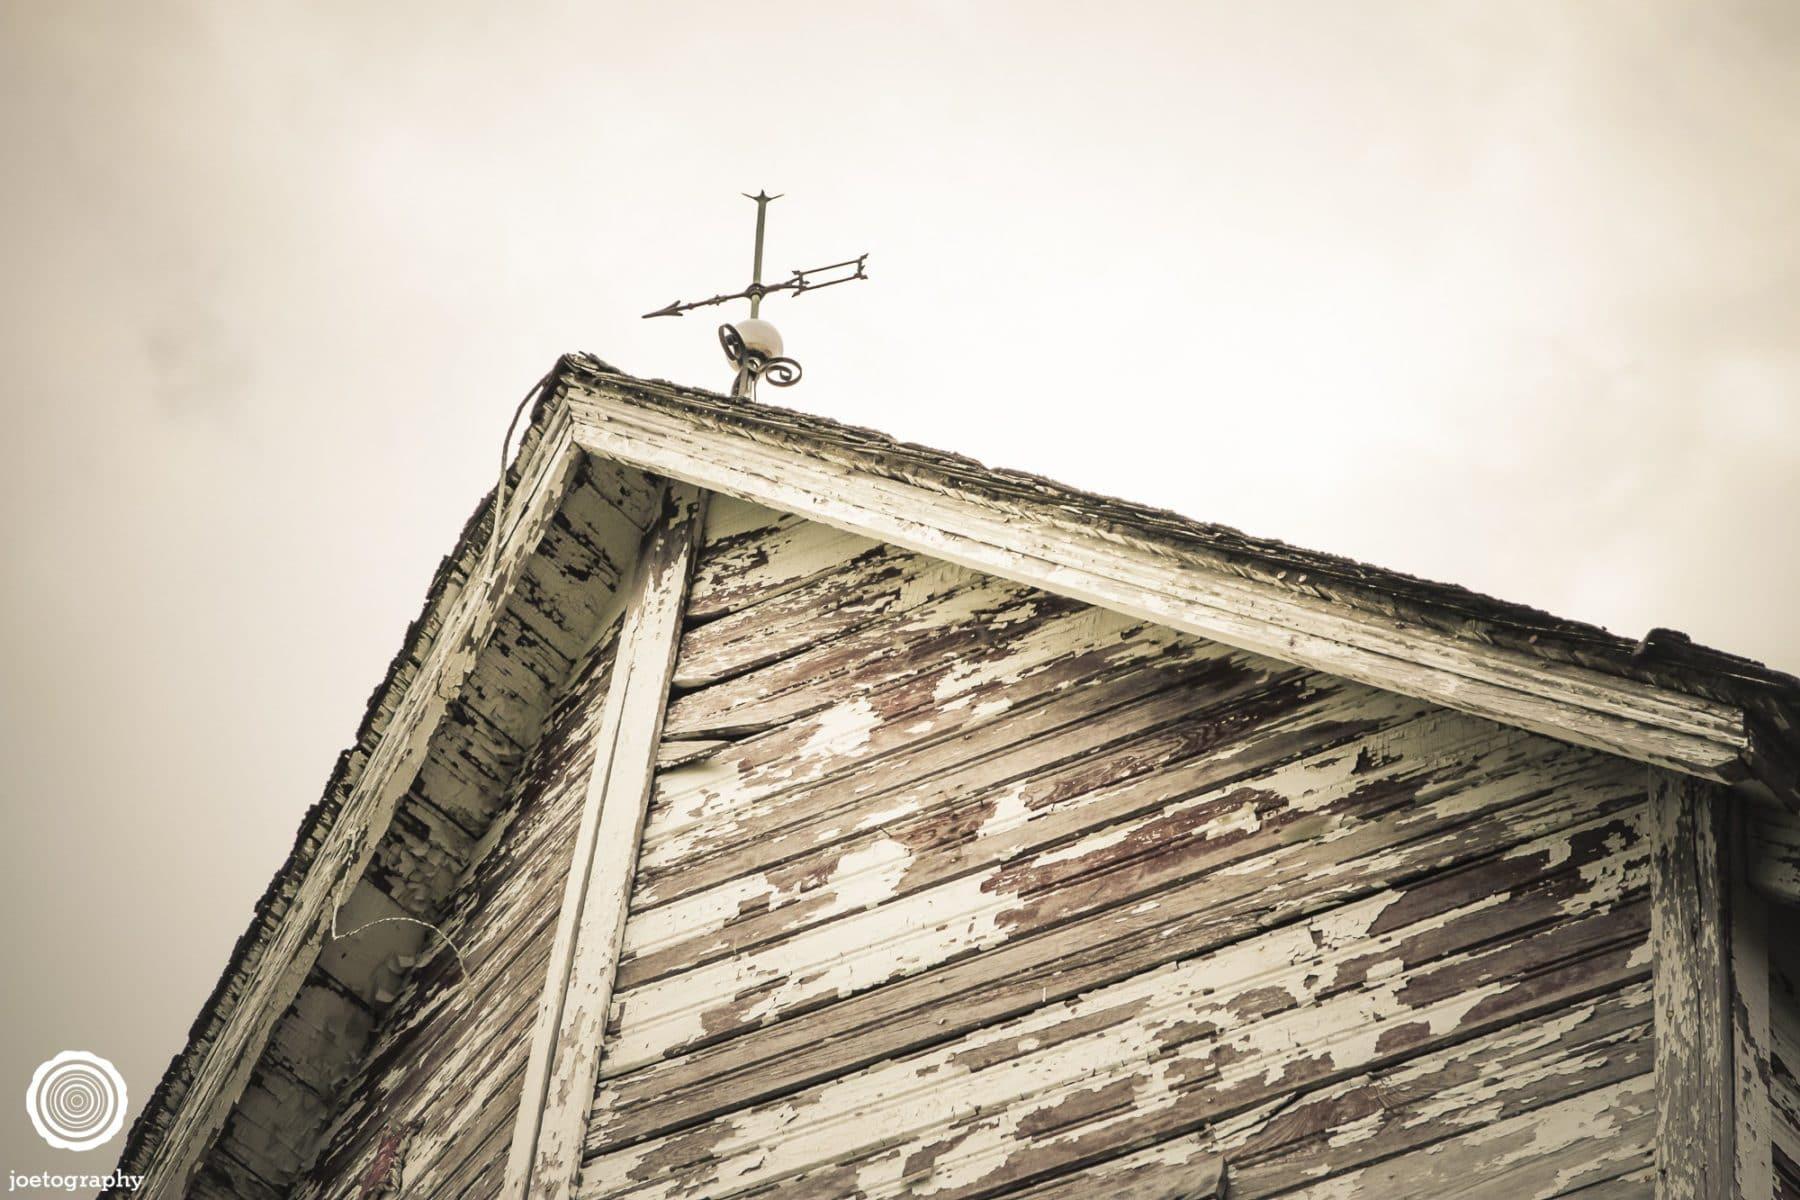 polygonal-barn-architecture-photos-shelbyville-indiana-8